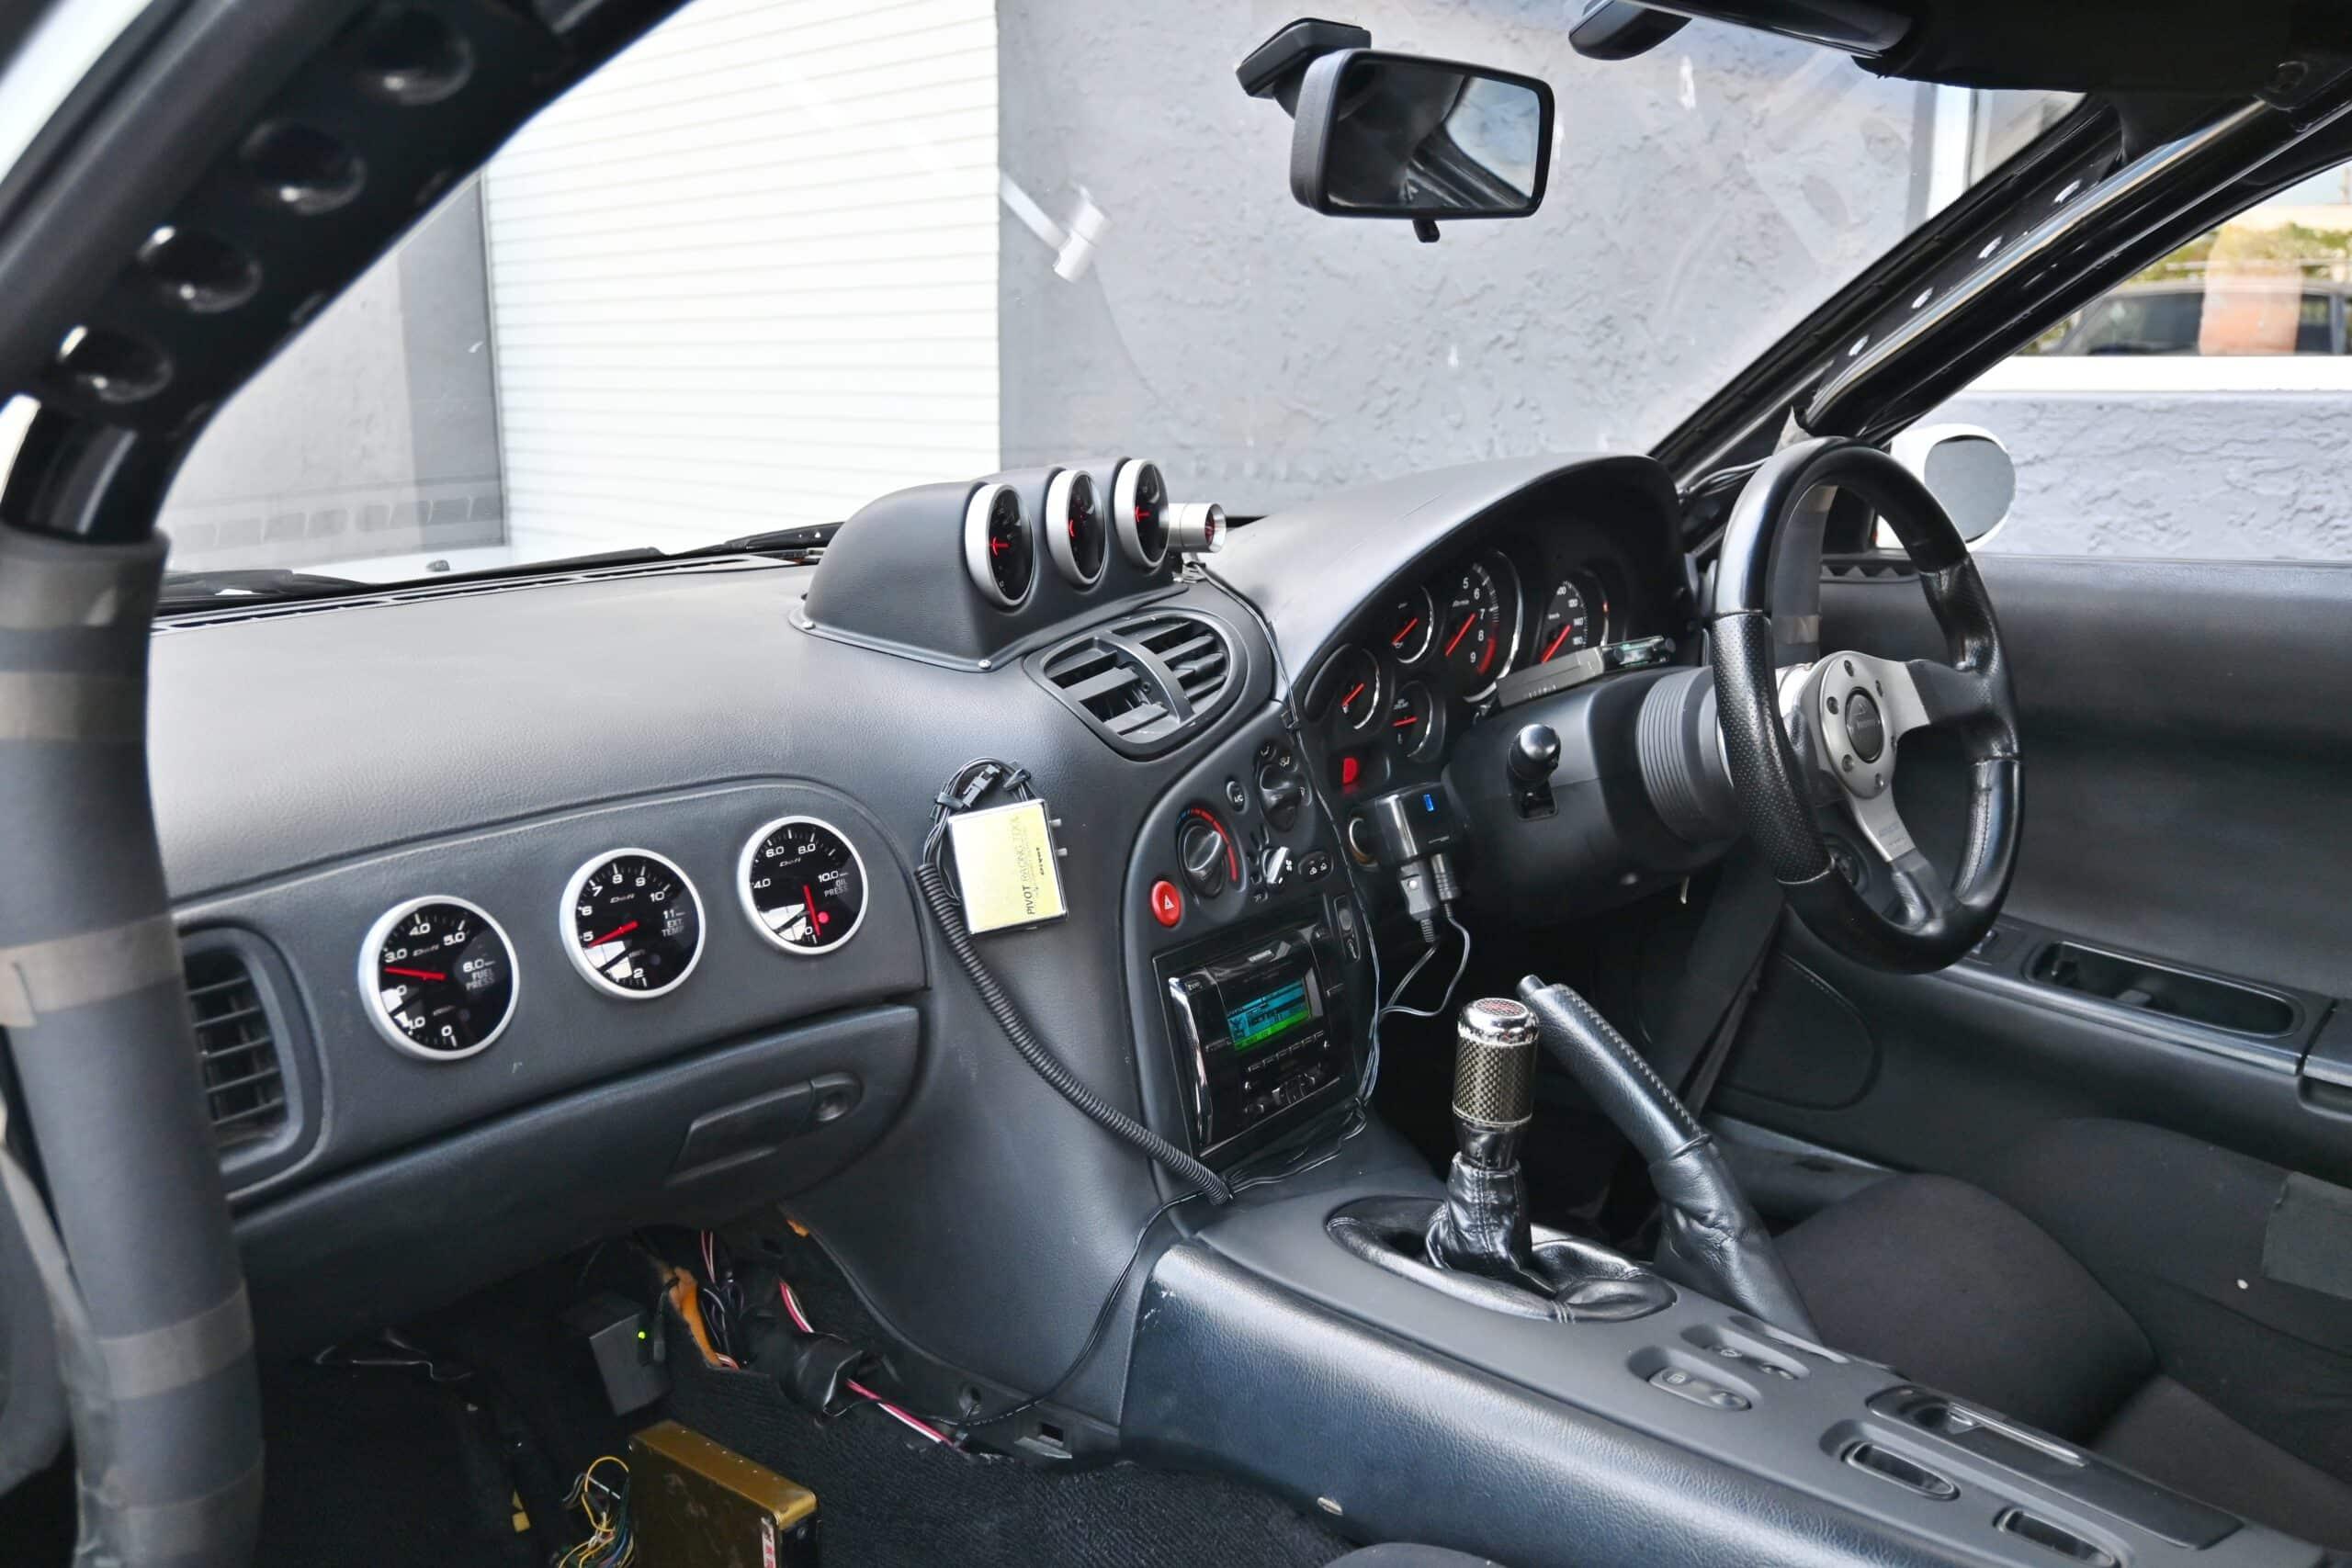 1993 Mazda RX-7 FD3S Efini Street/Track Street port T04R Single Turbo-Ohlins Coilovers-LSD-Titanium Exhaust-Brembo Brakes